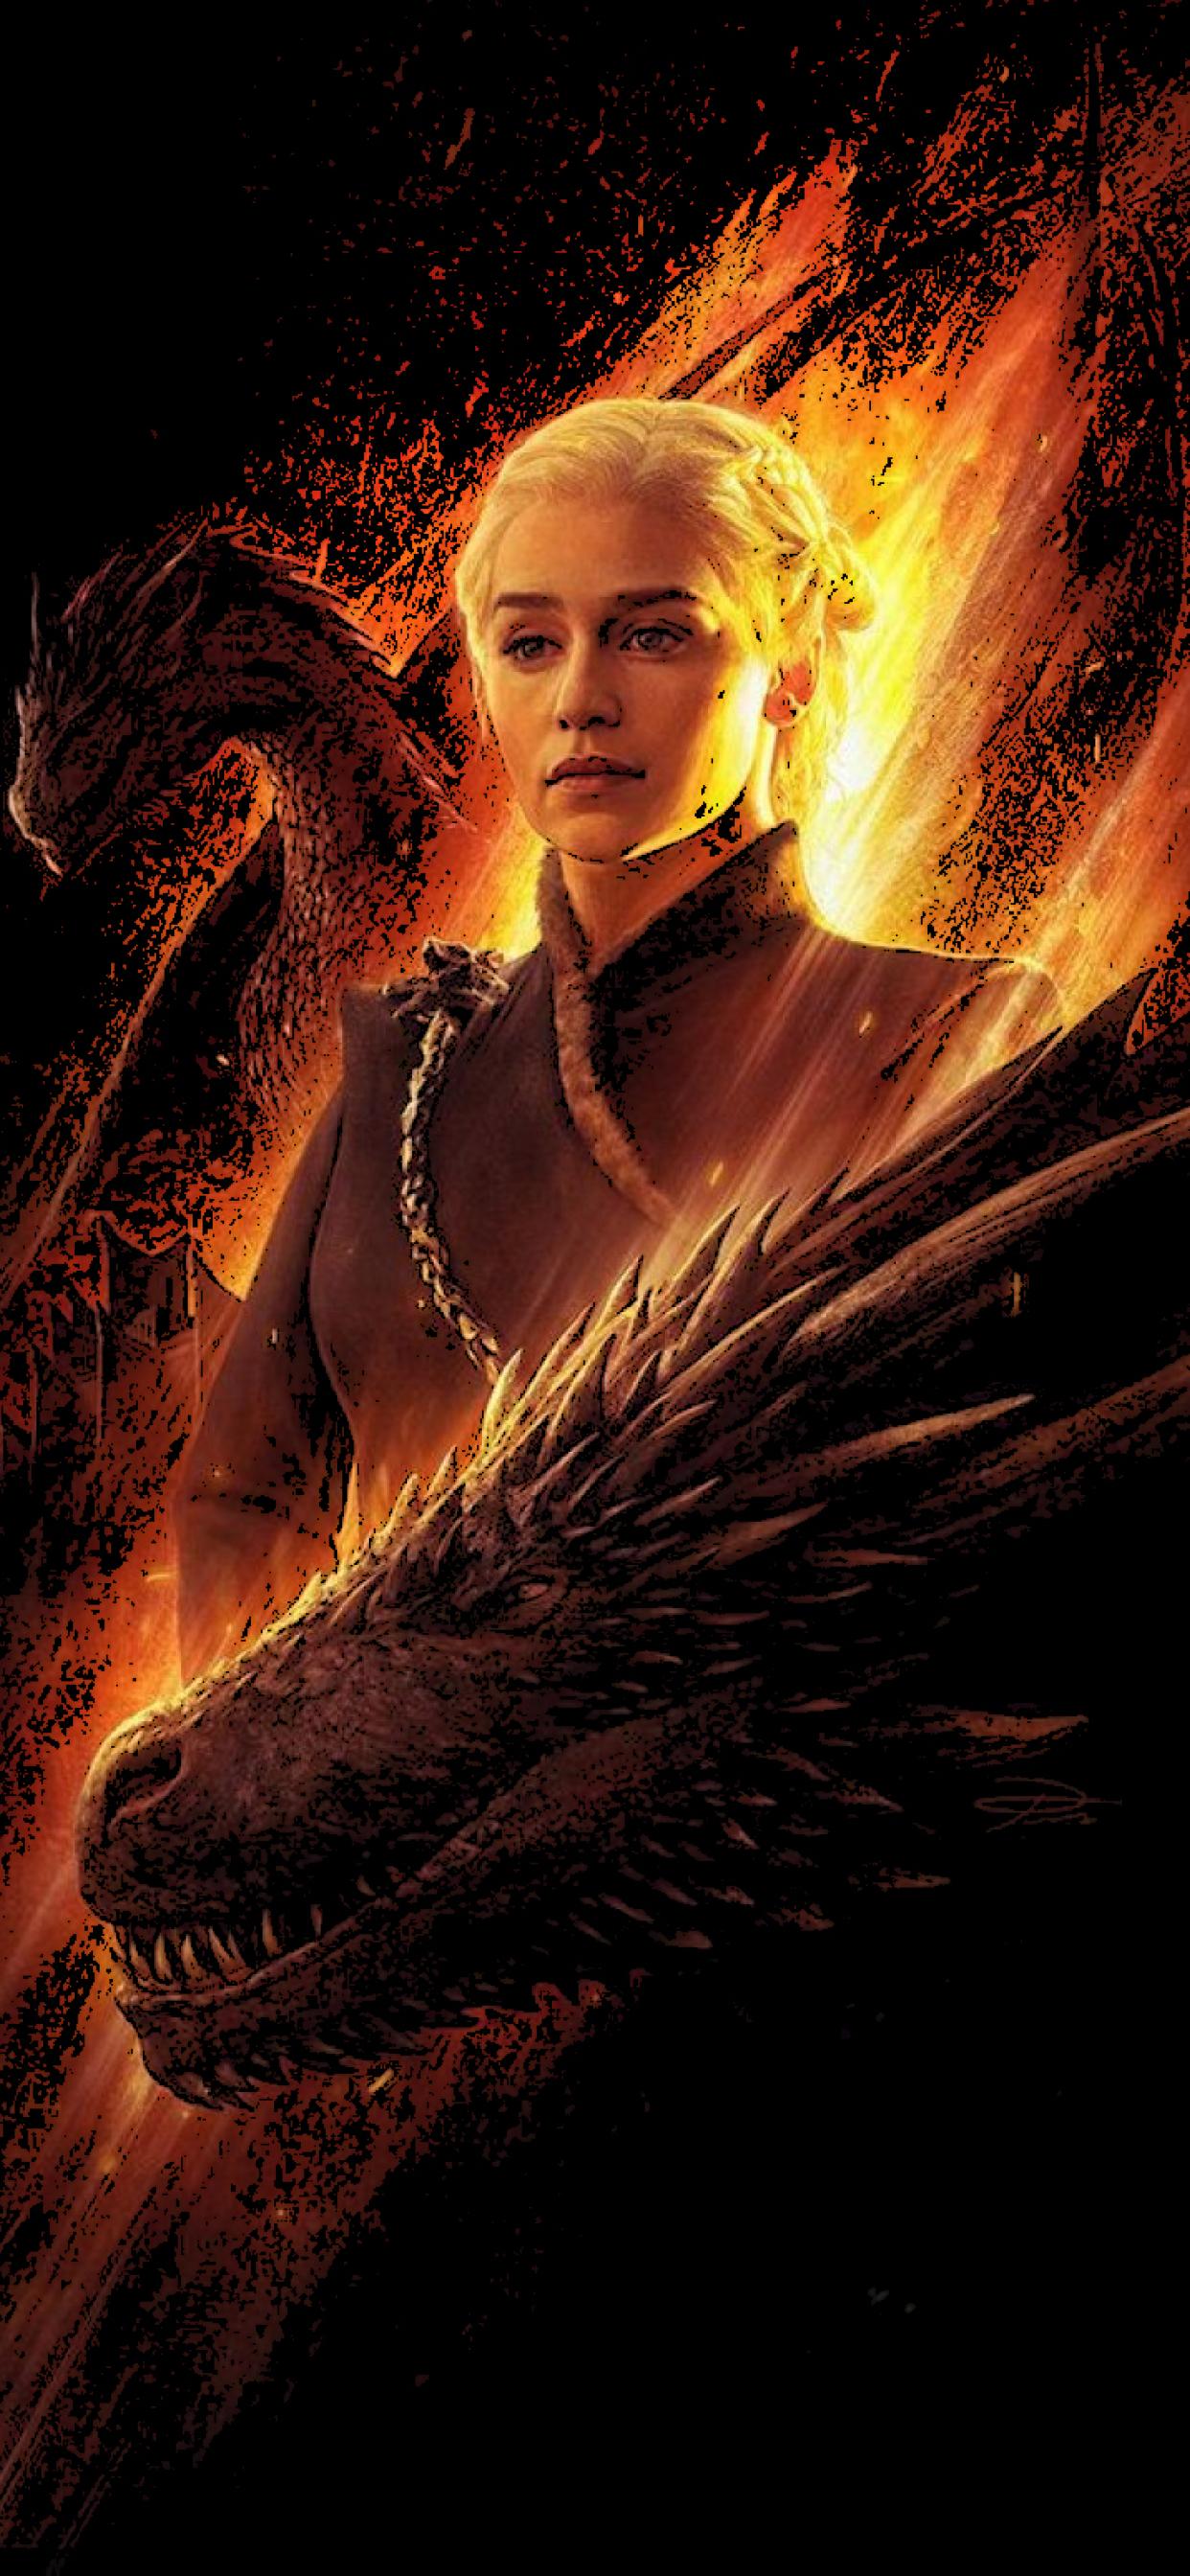 Daenerys Targaryen Game Of Thrones Wallpaper 4k , HD Wallpaper & Backgrounds